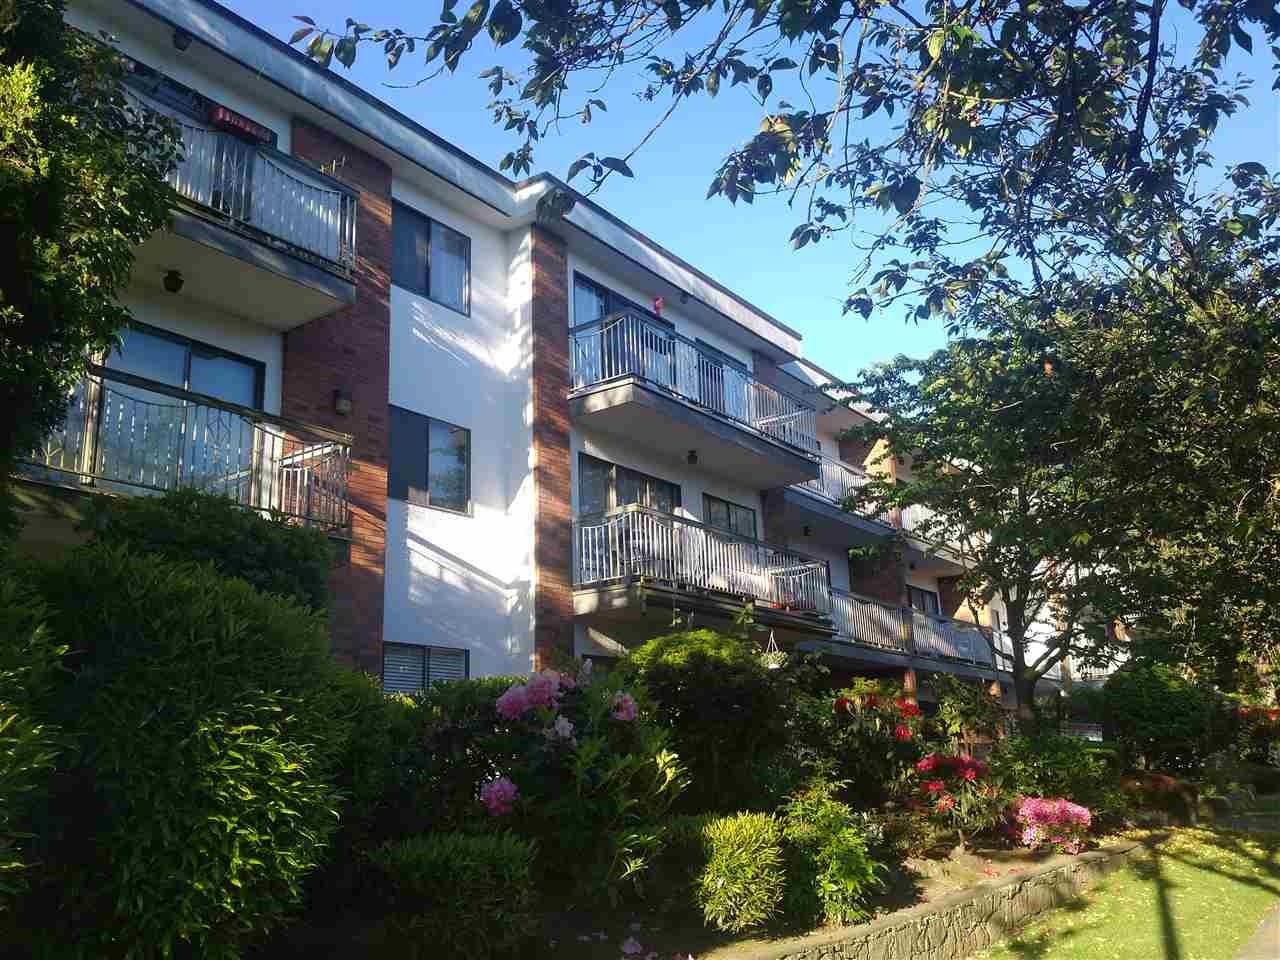 "Main Photo: 309 1950 W 8TH Avenue in Vancouver: Kitsilano Condo for sale in ""MARQUIS MANOR"" (Vancouver West)  : MLS®# R2069129"